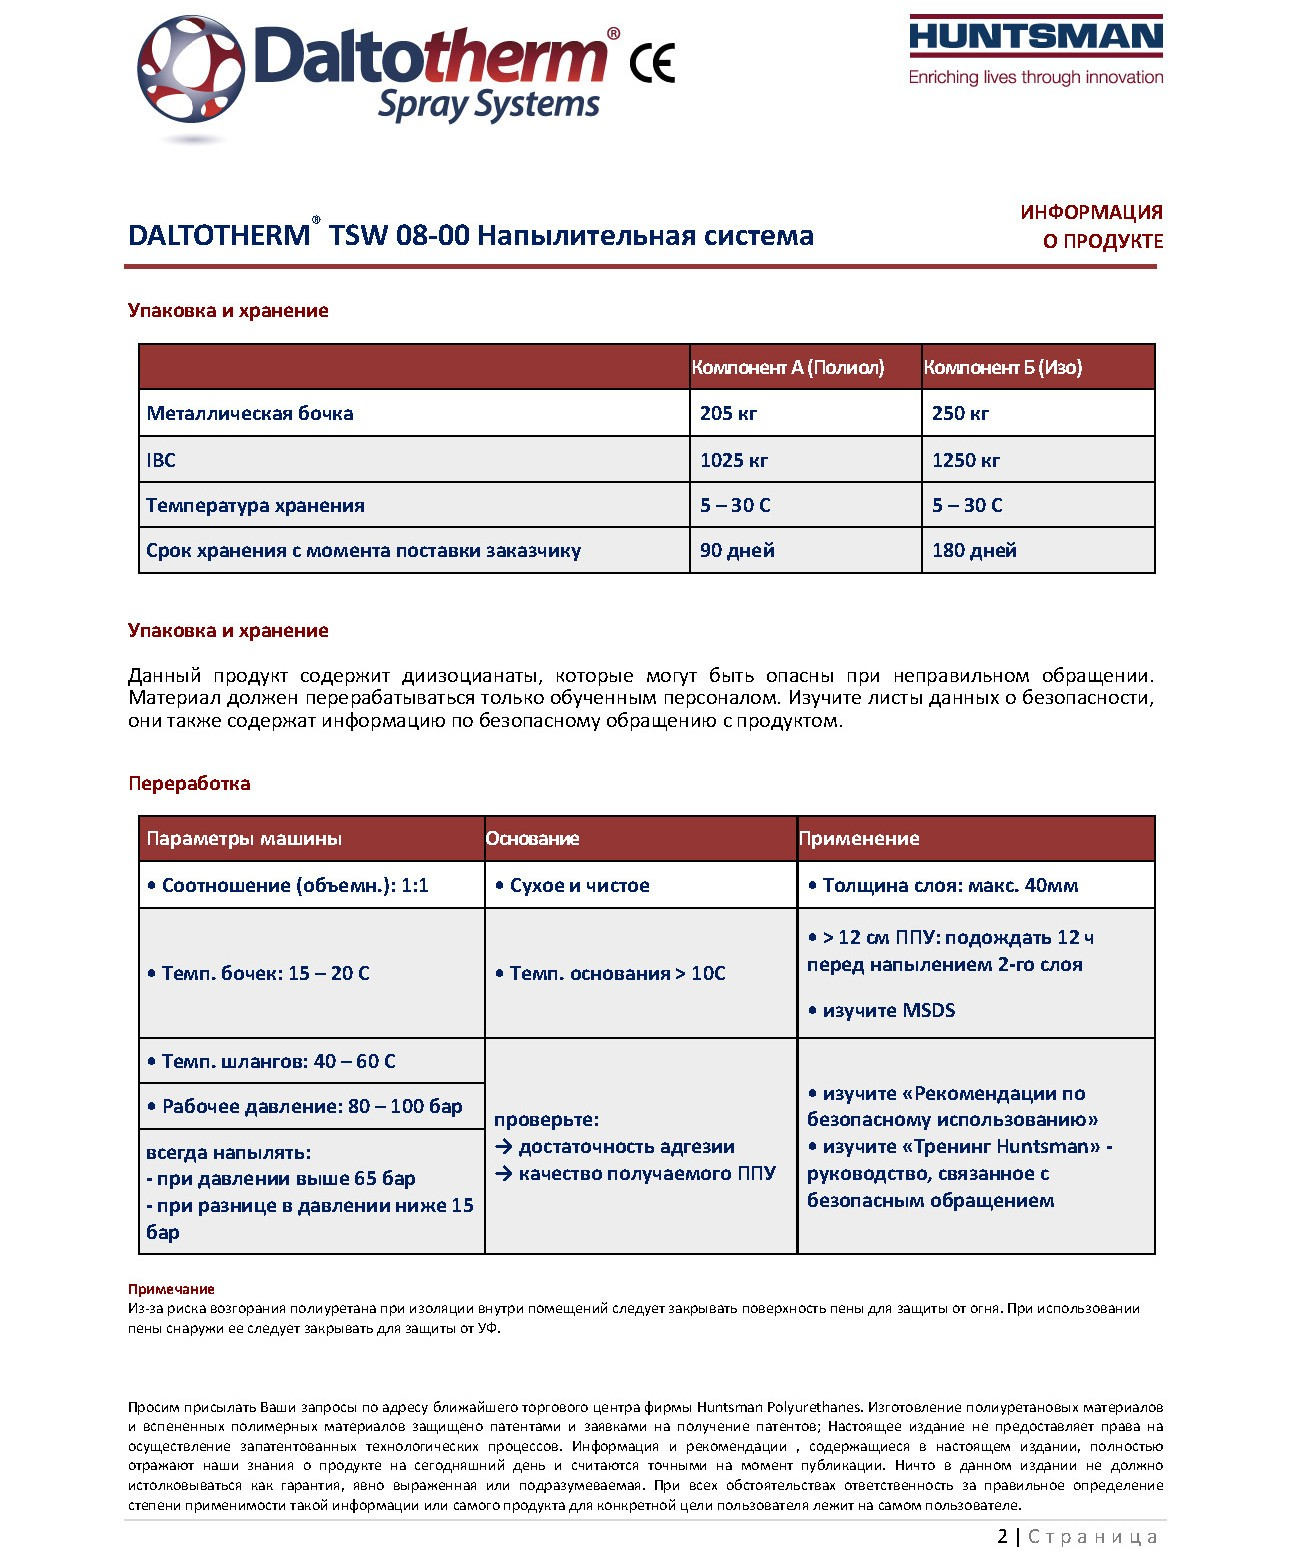 Daltotherm_TSW_08-00 компоненты Huntsman NMG Ханстман_Страница_2